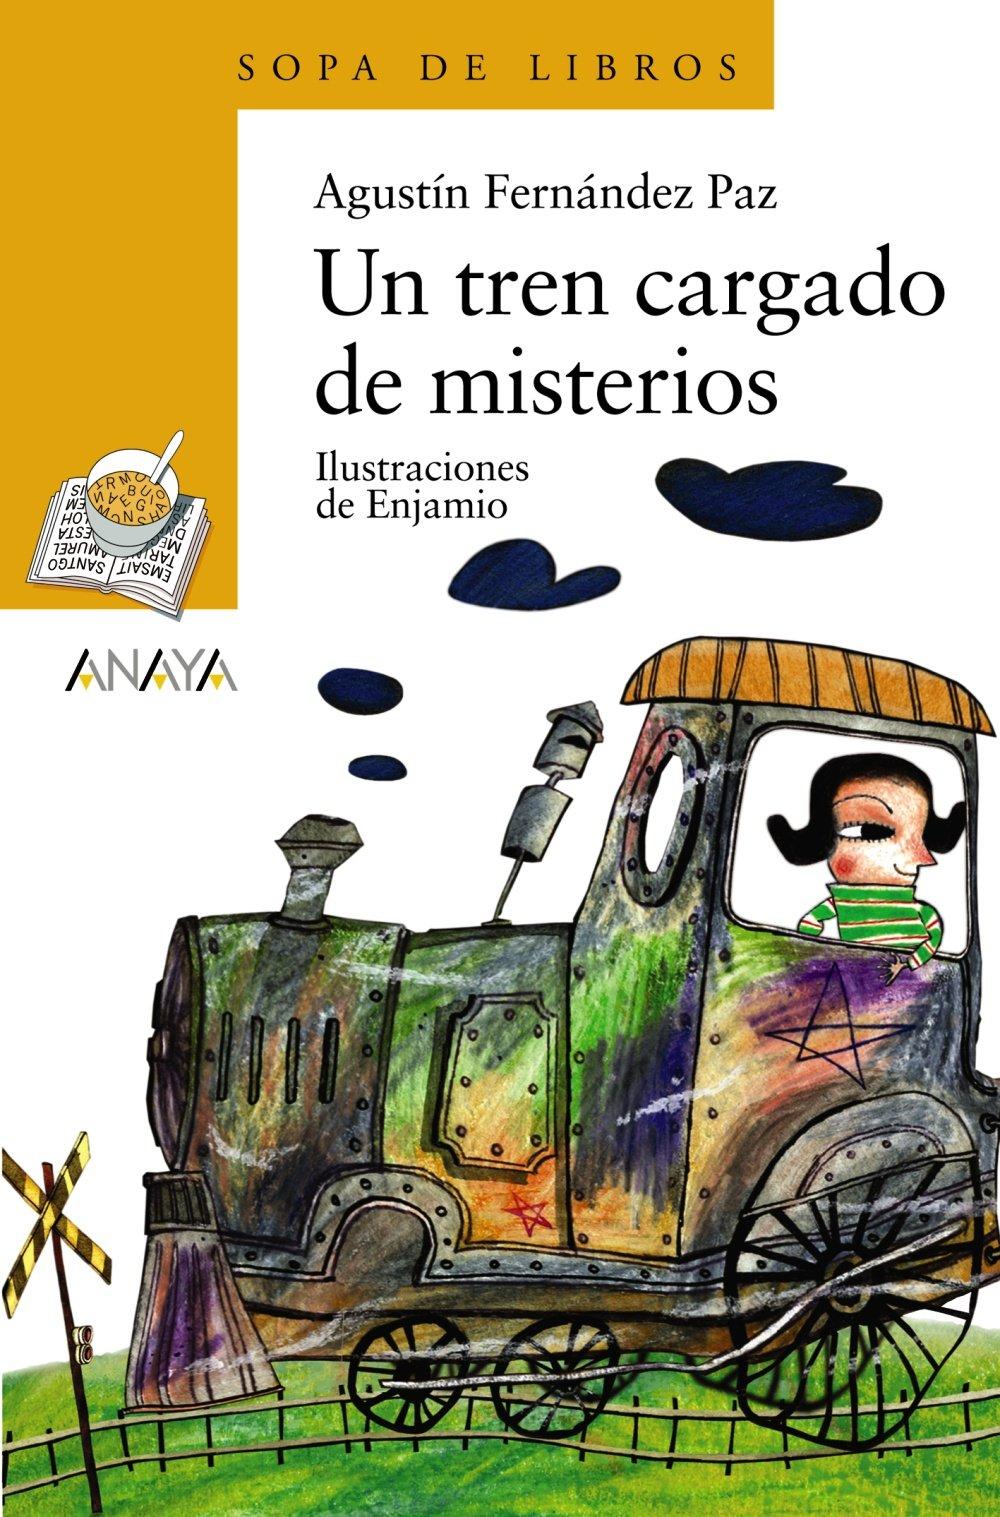 Un tren cargado de misterios (Spanish Edition): Agustin Fernandez Paz, Luis Castro Enjamio: 9788466736886: Amazon.com: Books